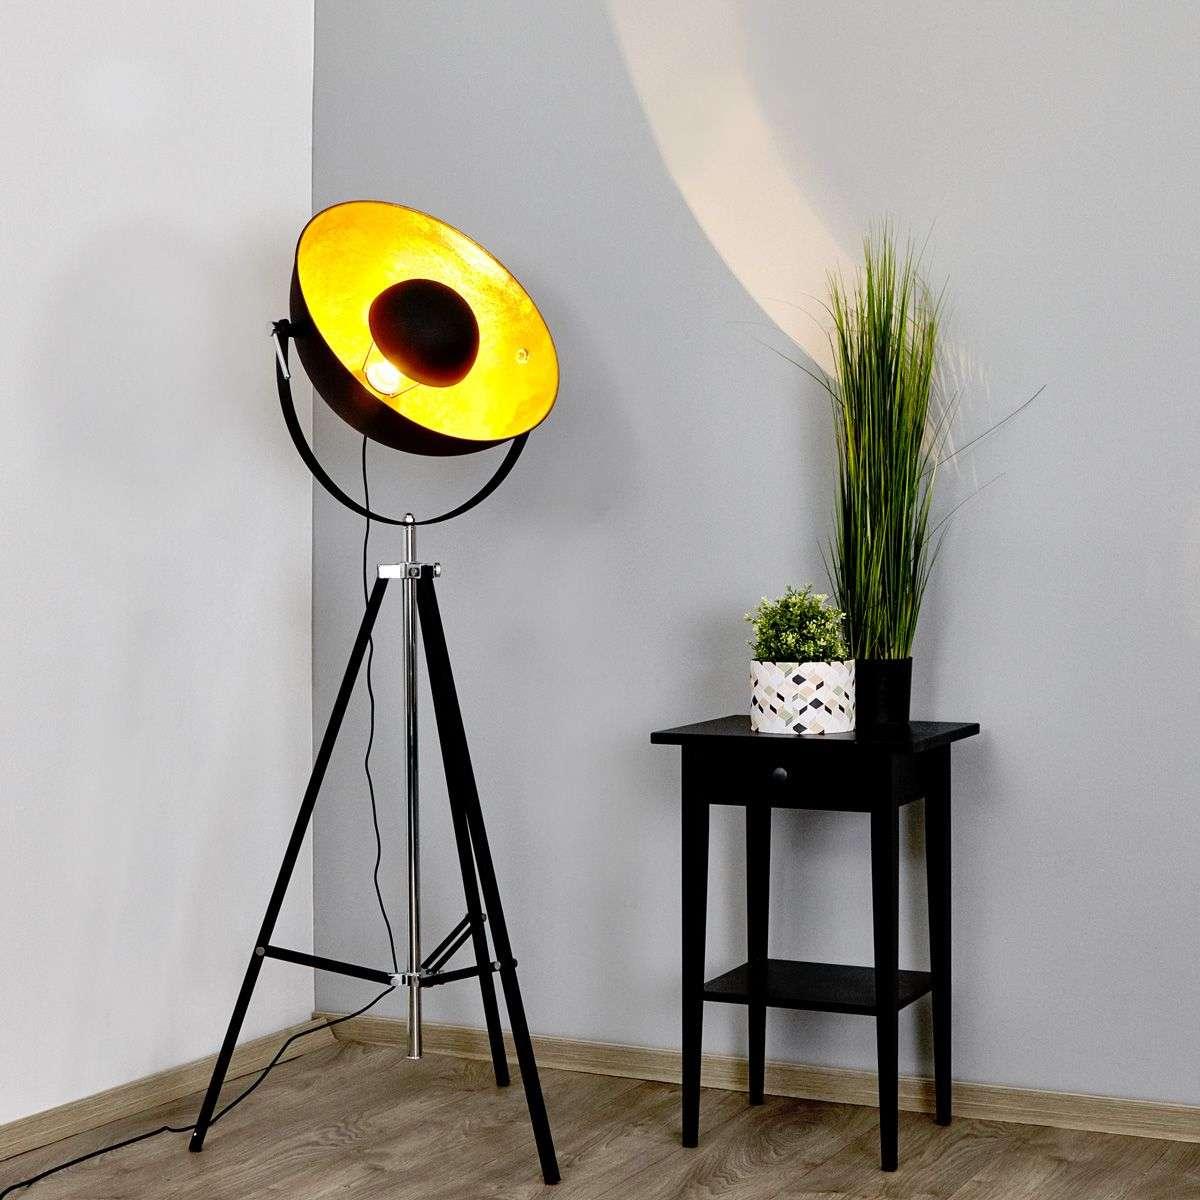 Extravagant floor lamp Mineva in black and gold-4018081-32